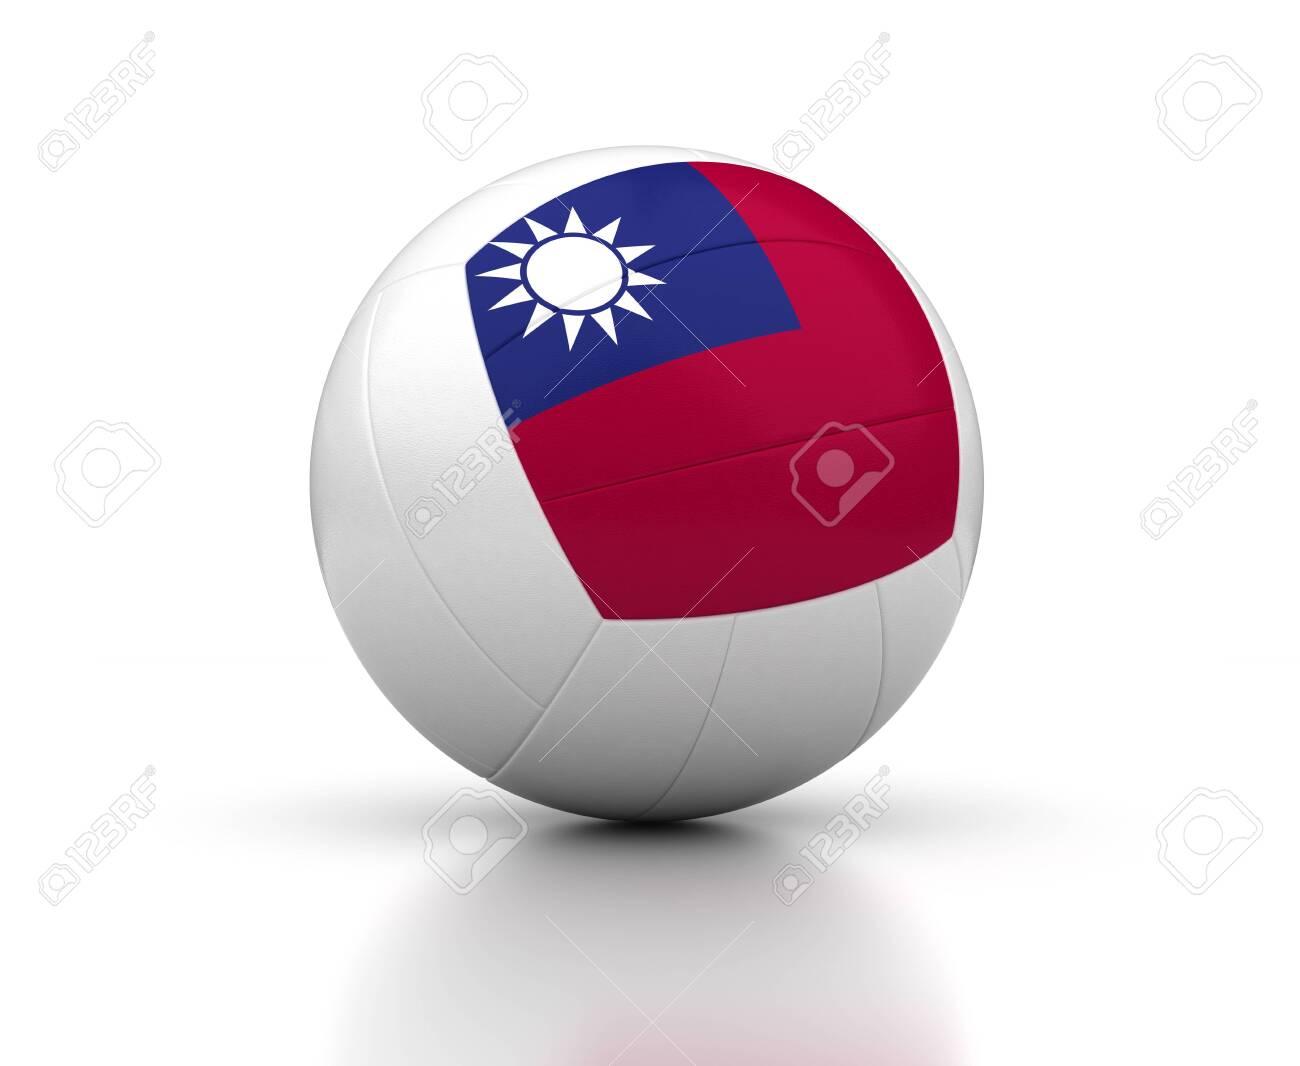 Taiwan Volleyball Team - 142619535